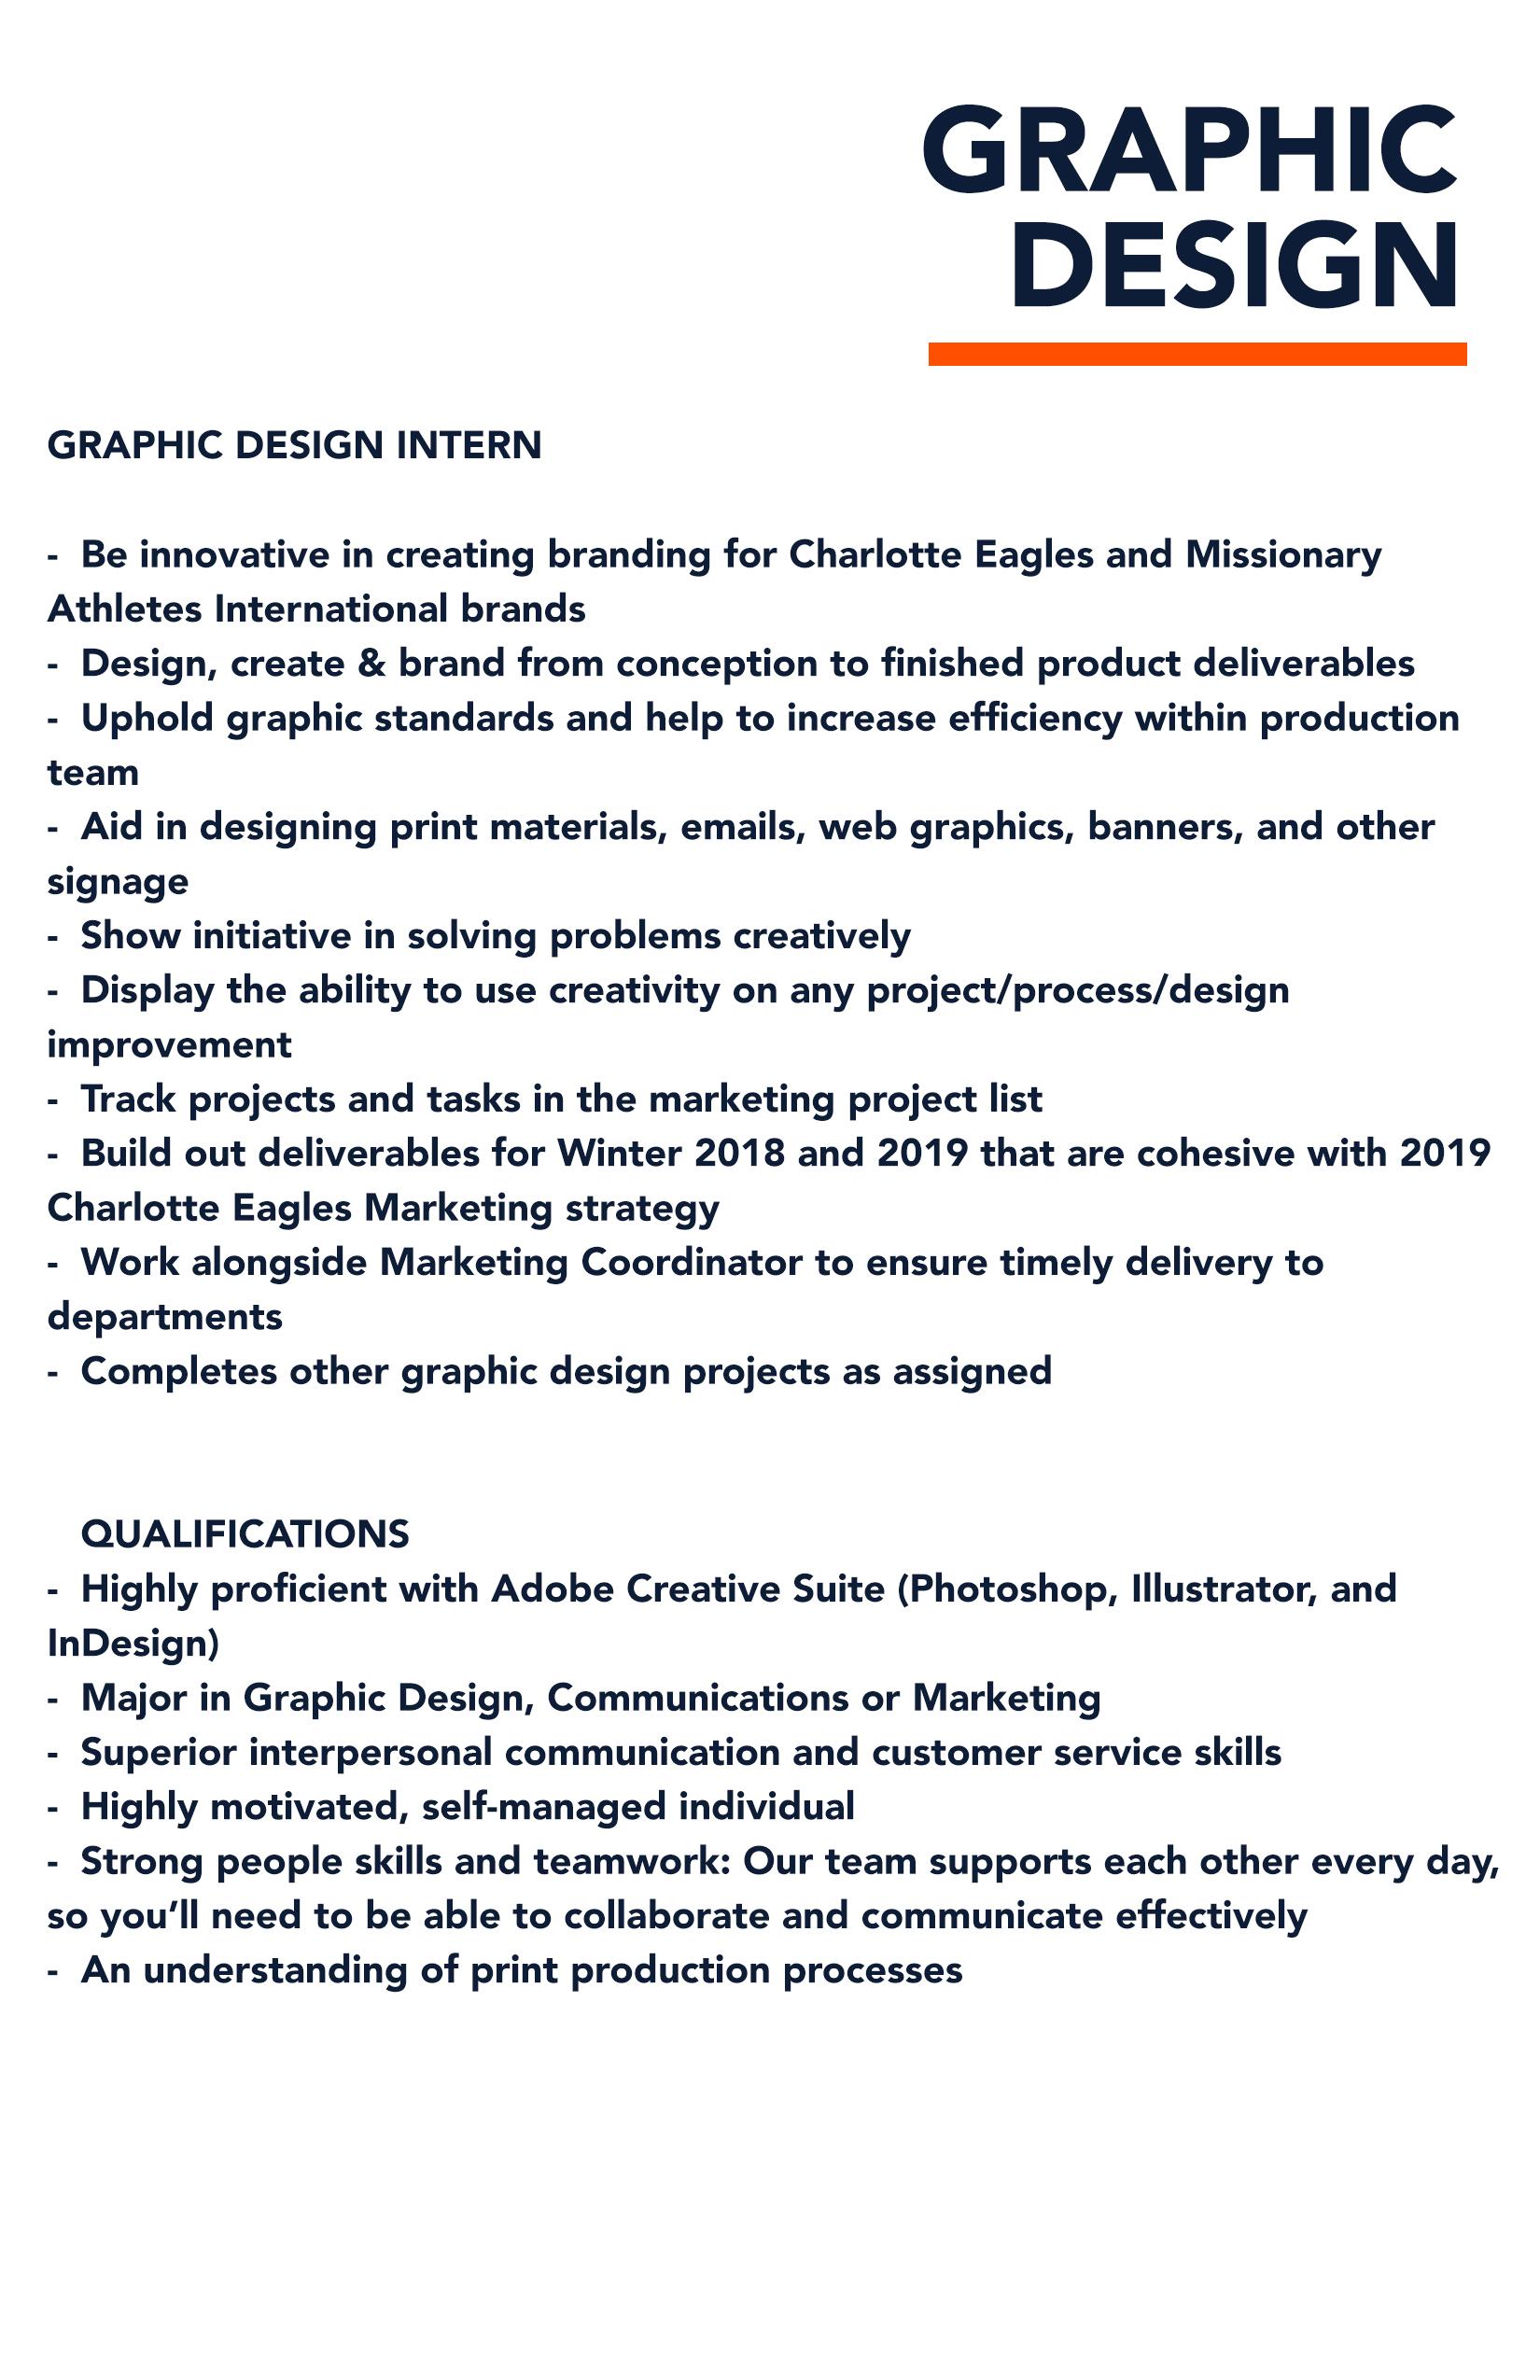 graphicdesigndescription.jpg